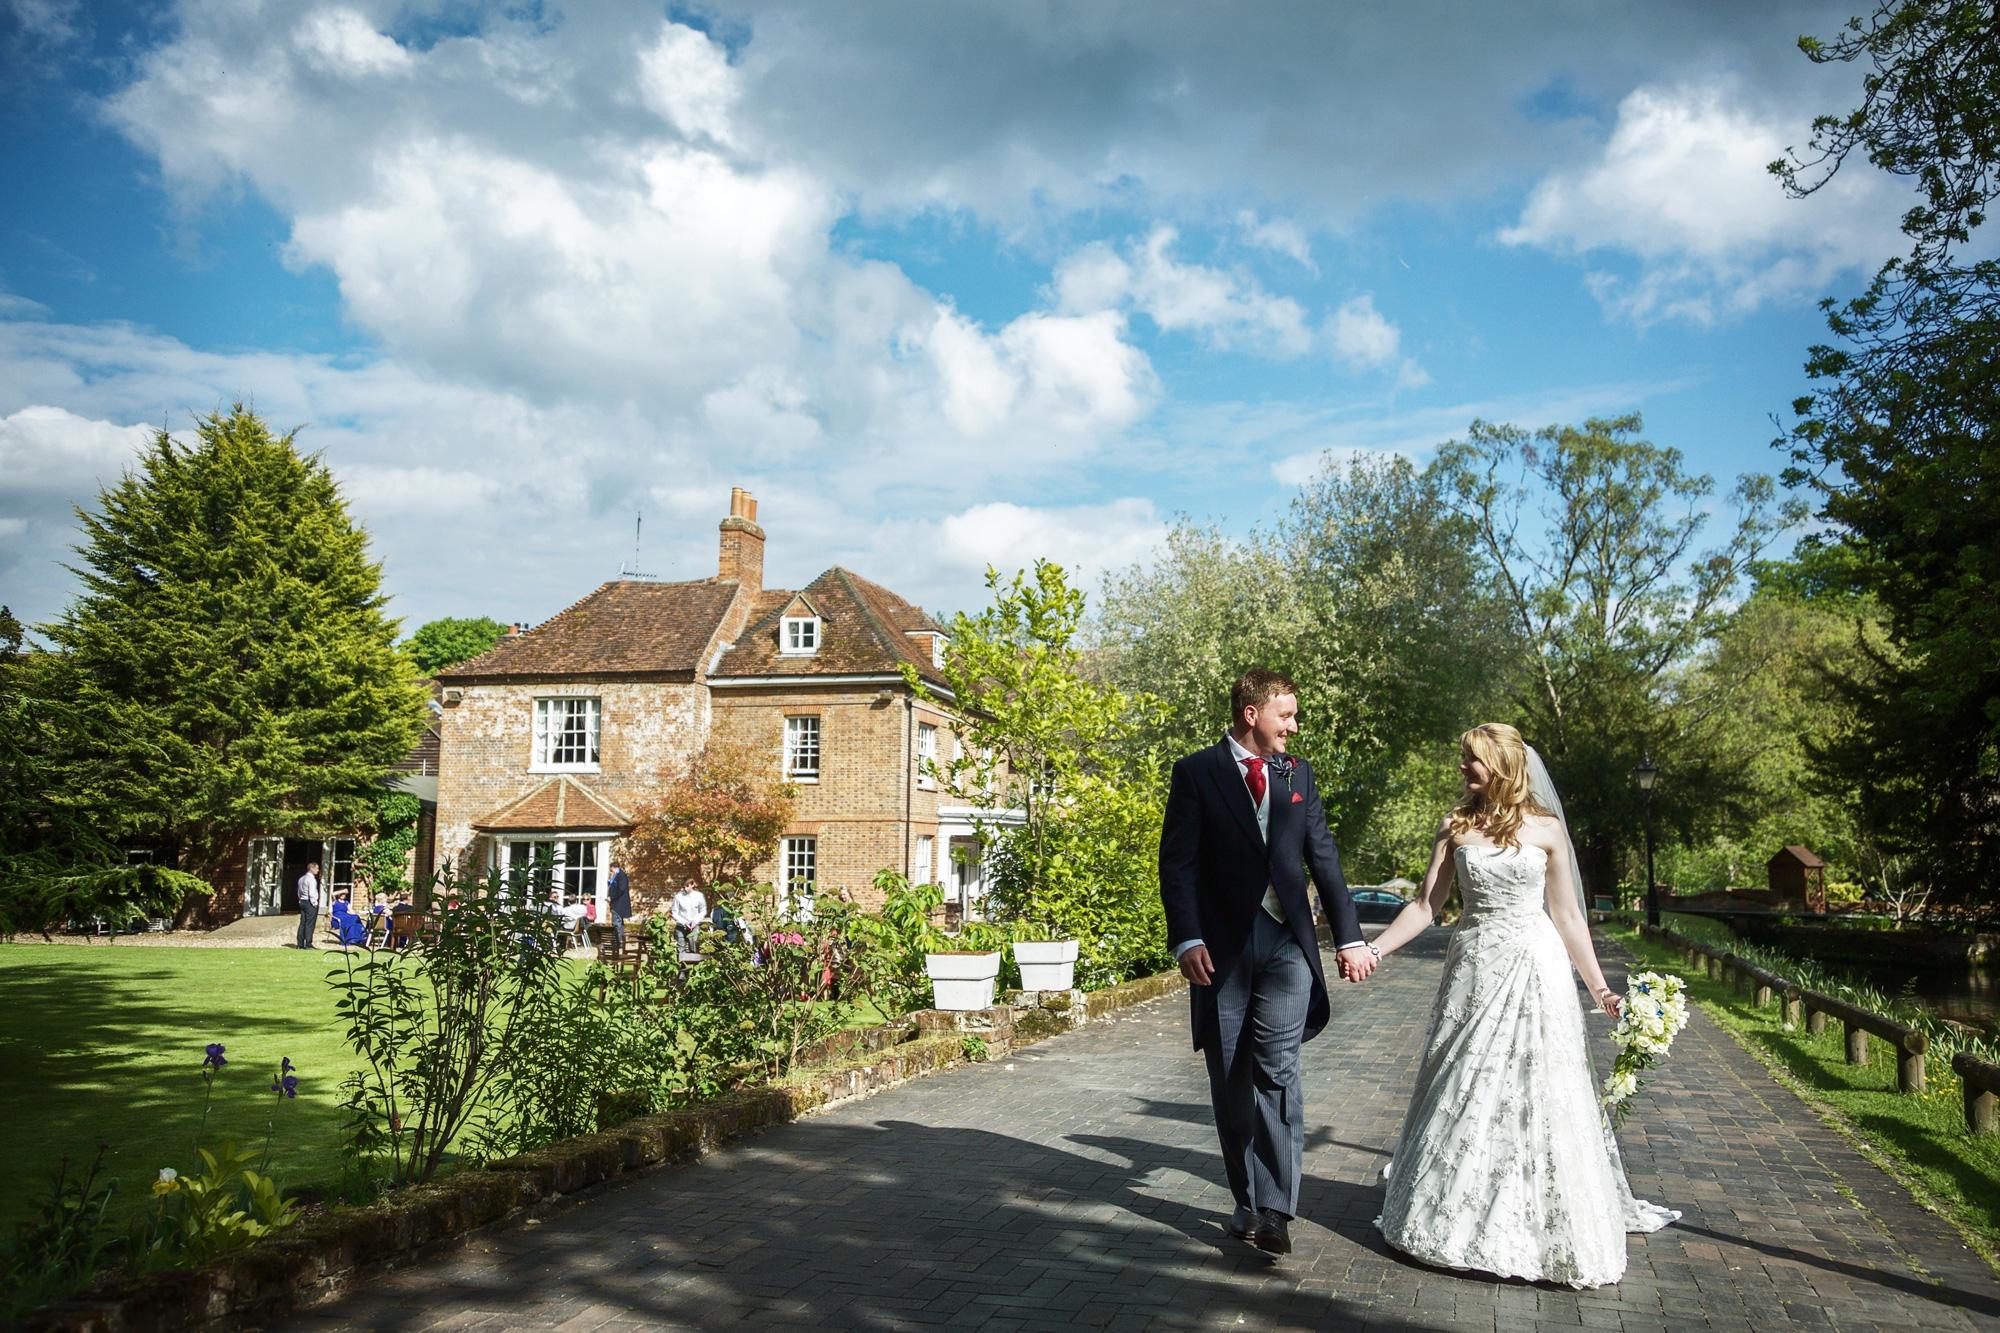 Adam_Hillier_Wedding_Photographer_Newbury_Berkshire_9 (5).jpg